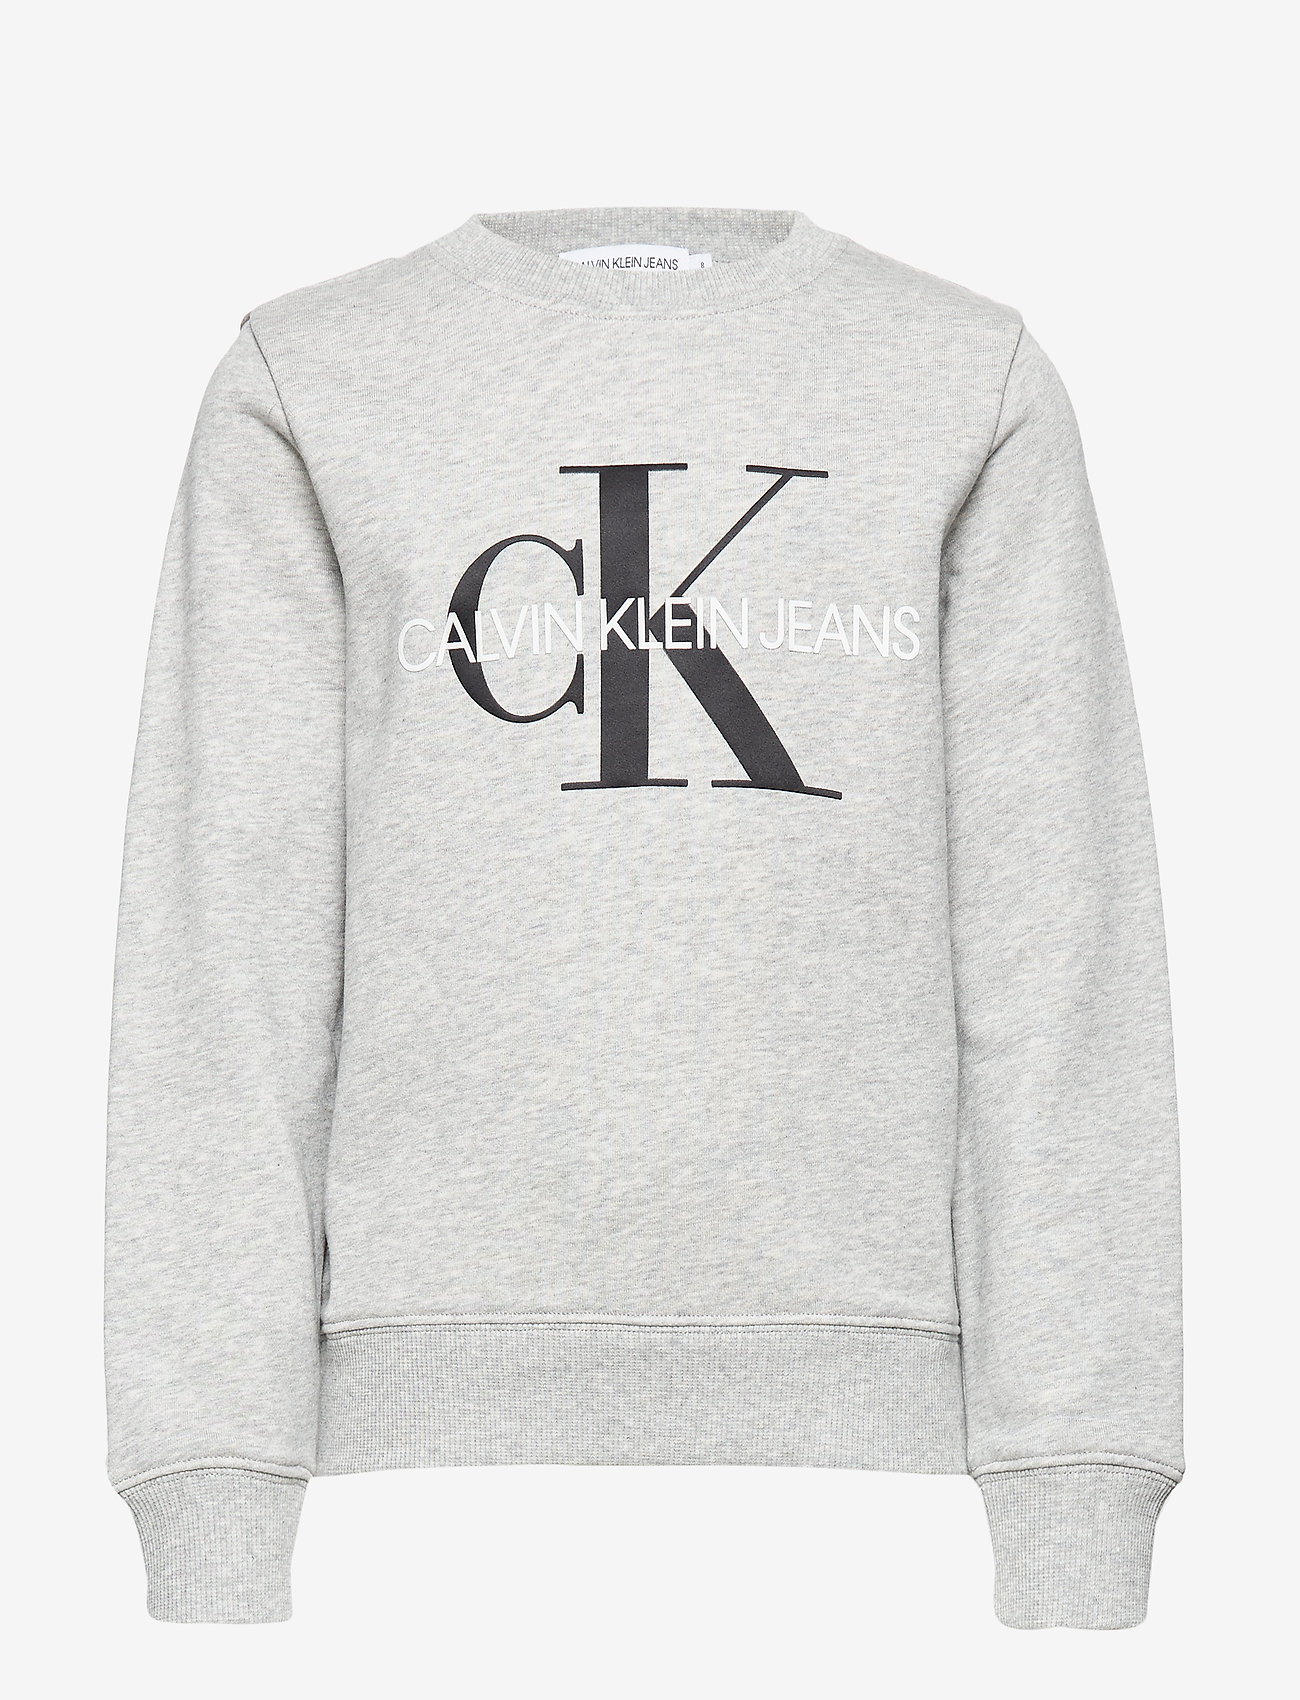 Calvin Klein - MONOGRAM LOGO SWEATSHIRT - sweatshirts - light grey heather - 0